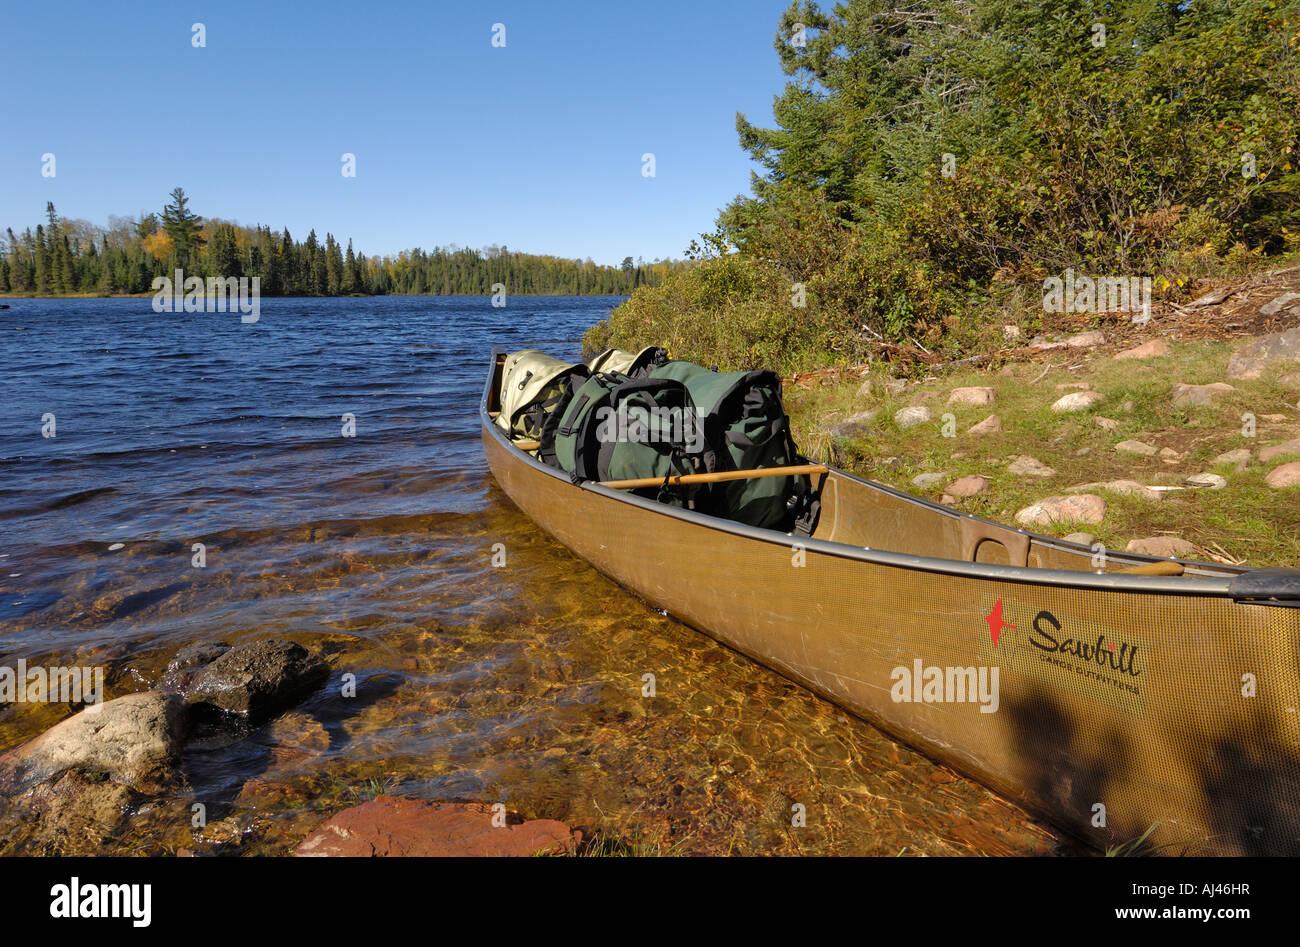 Canoe on Sitka Lake, Boundary Waters Canoe Area Wilderness, Superior National Forest, Minnesota, USA - Stock Image